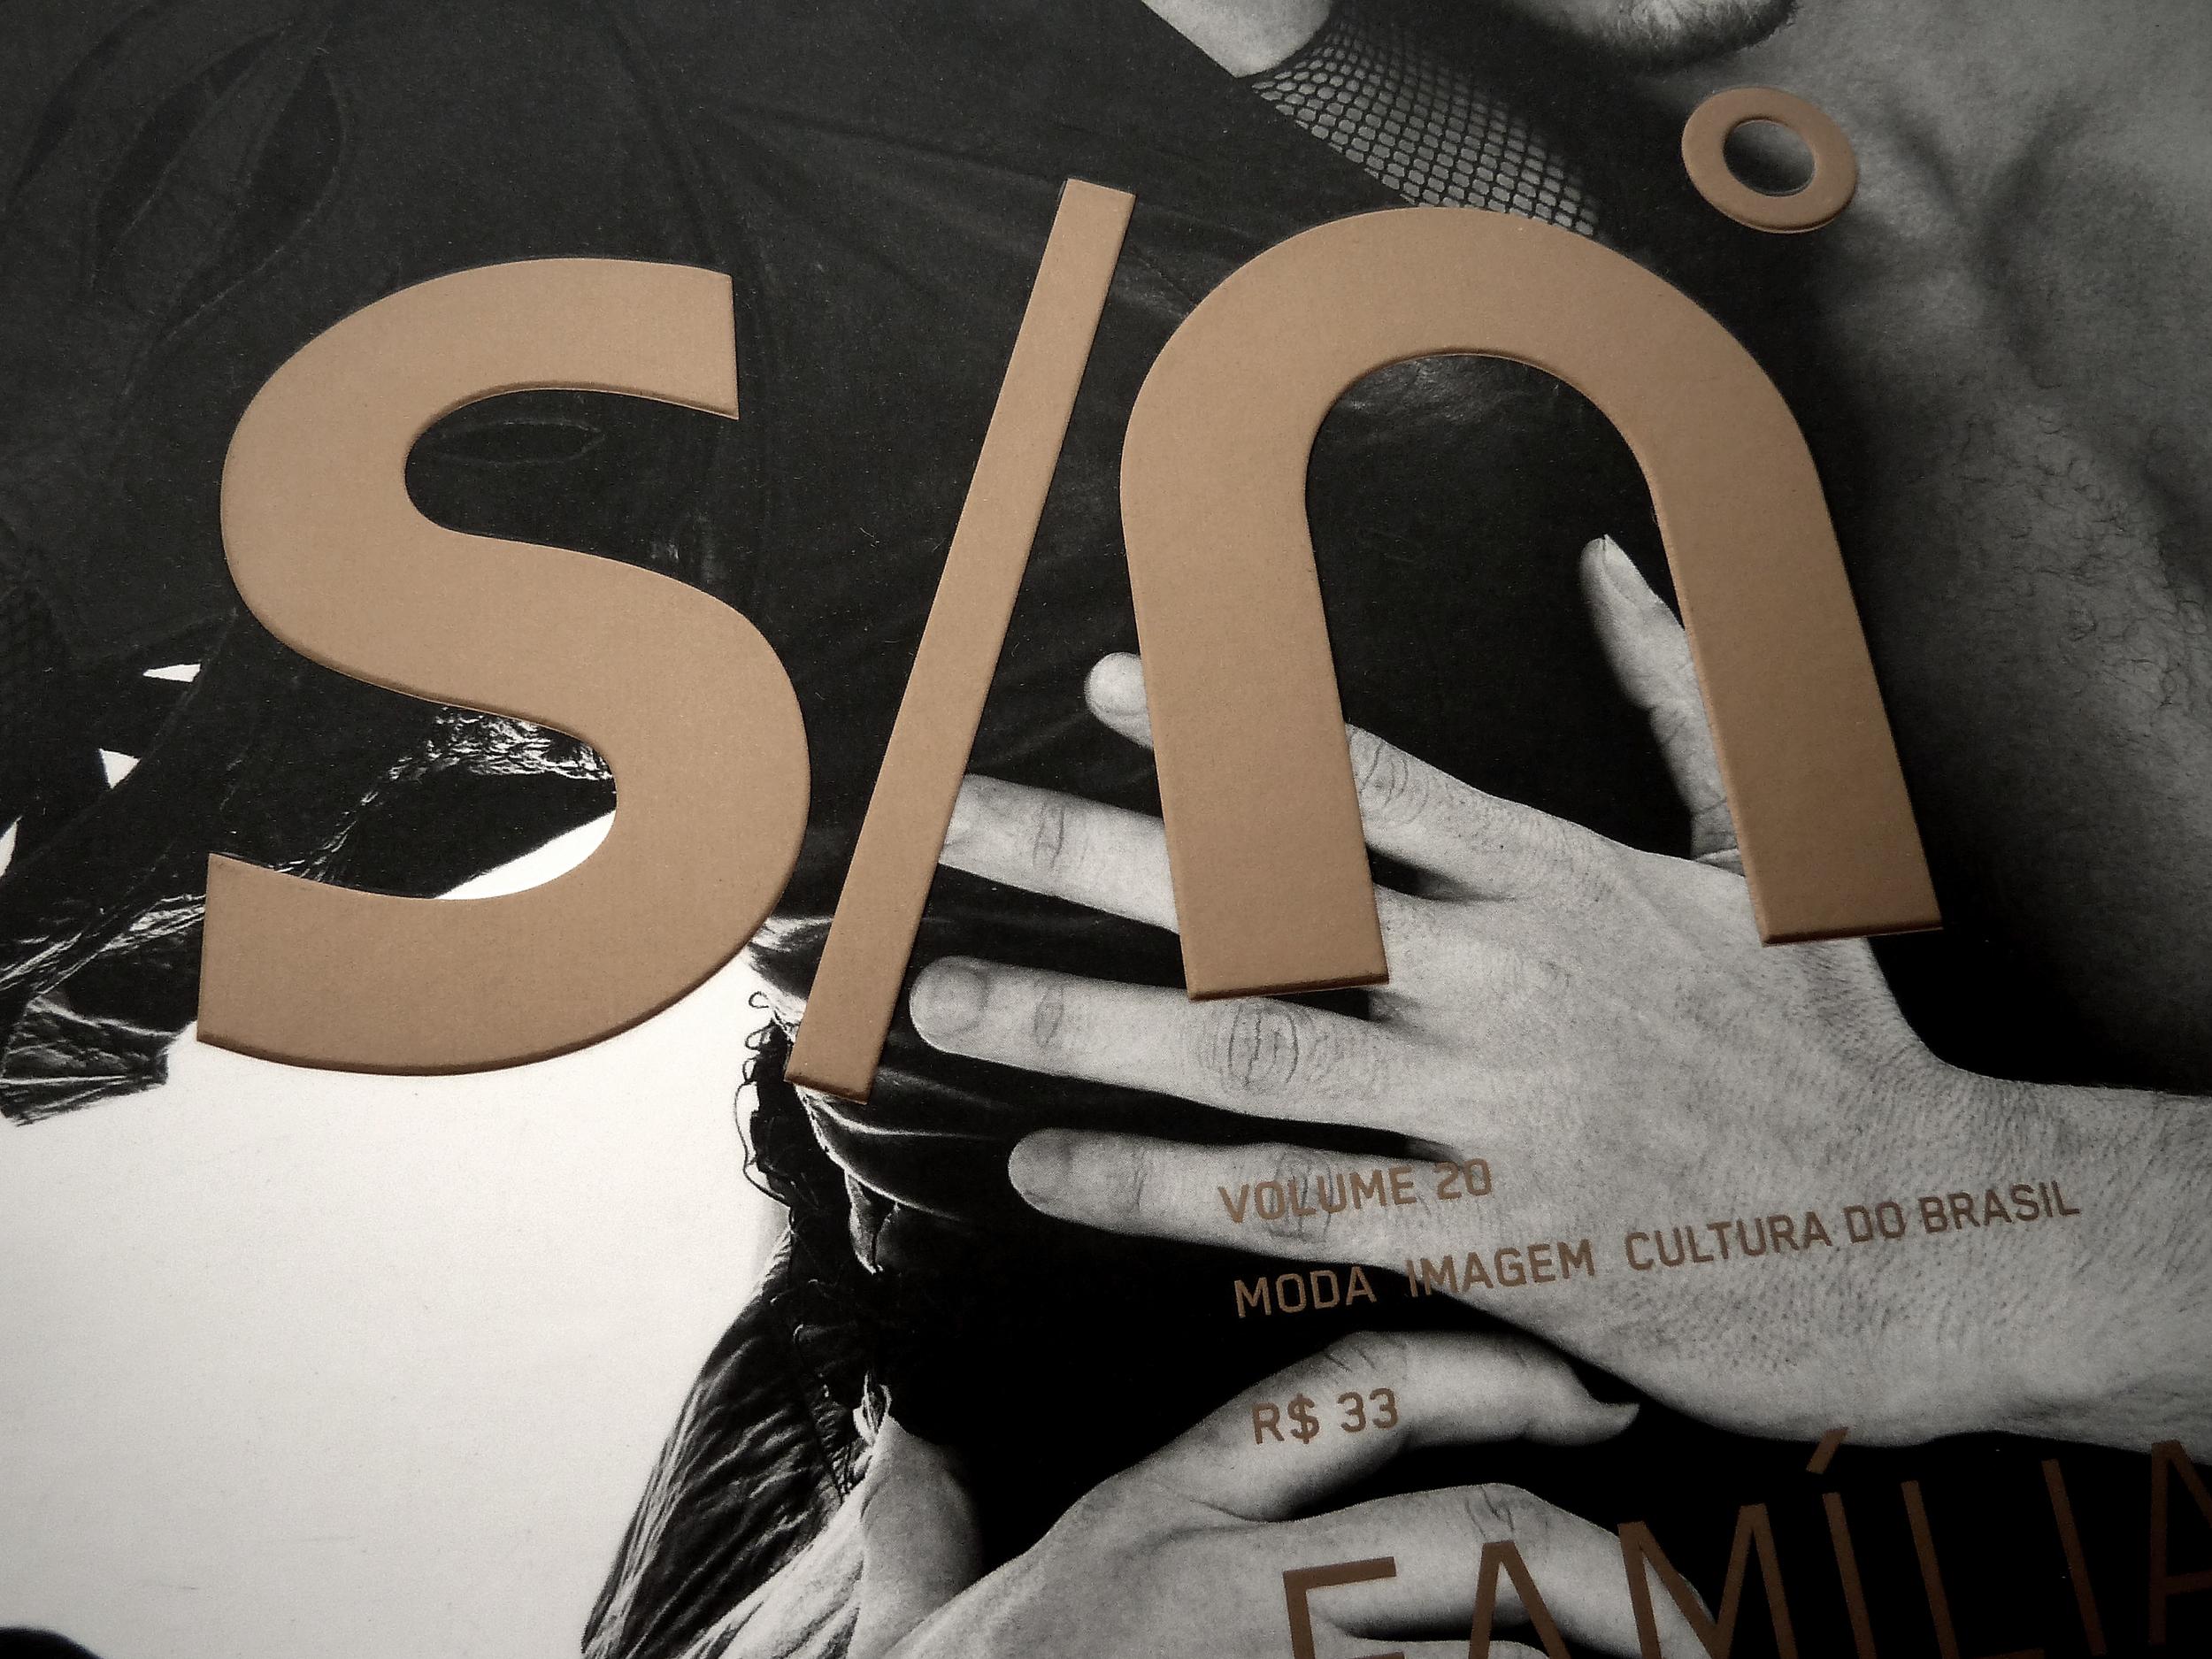 sn20_3.jpg